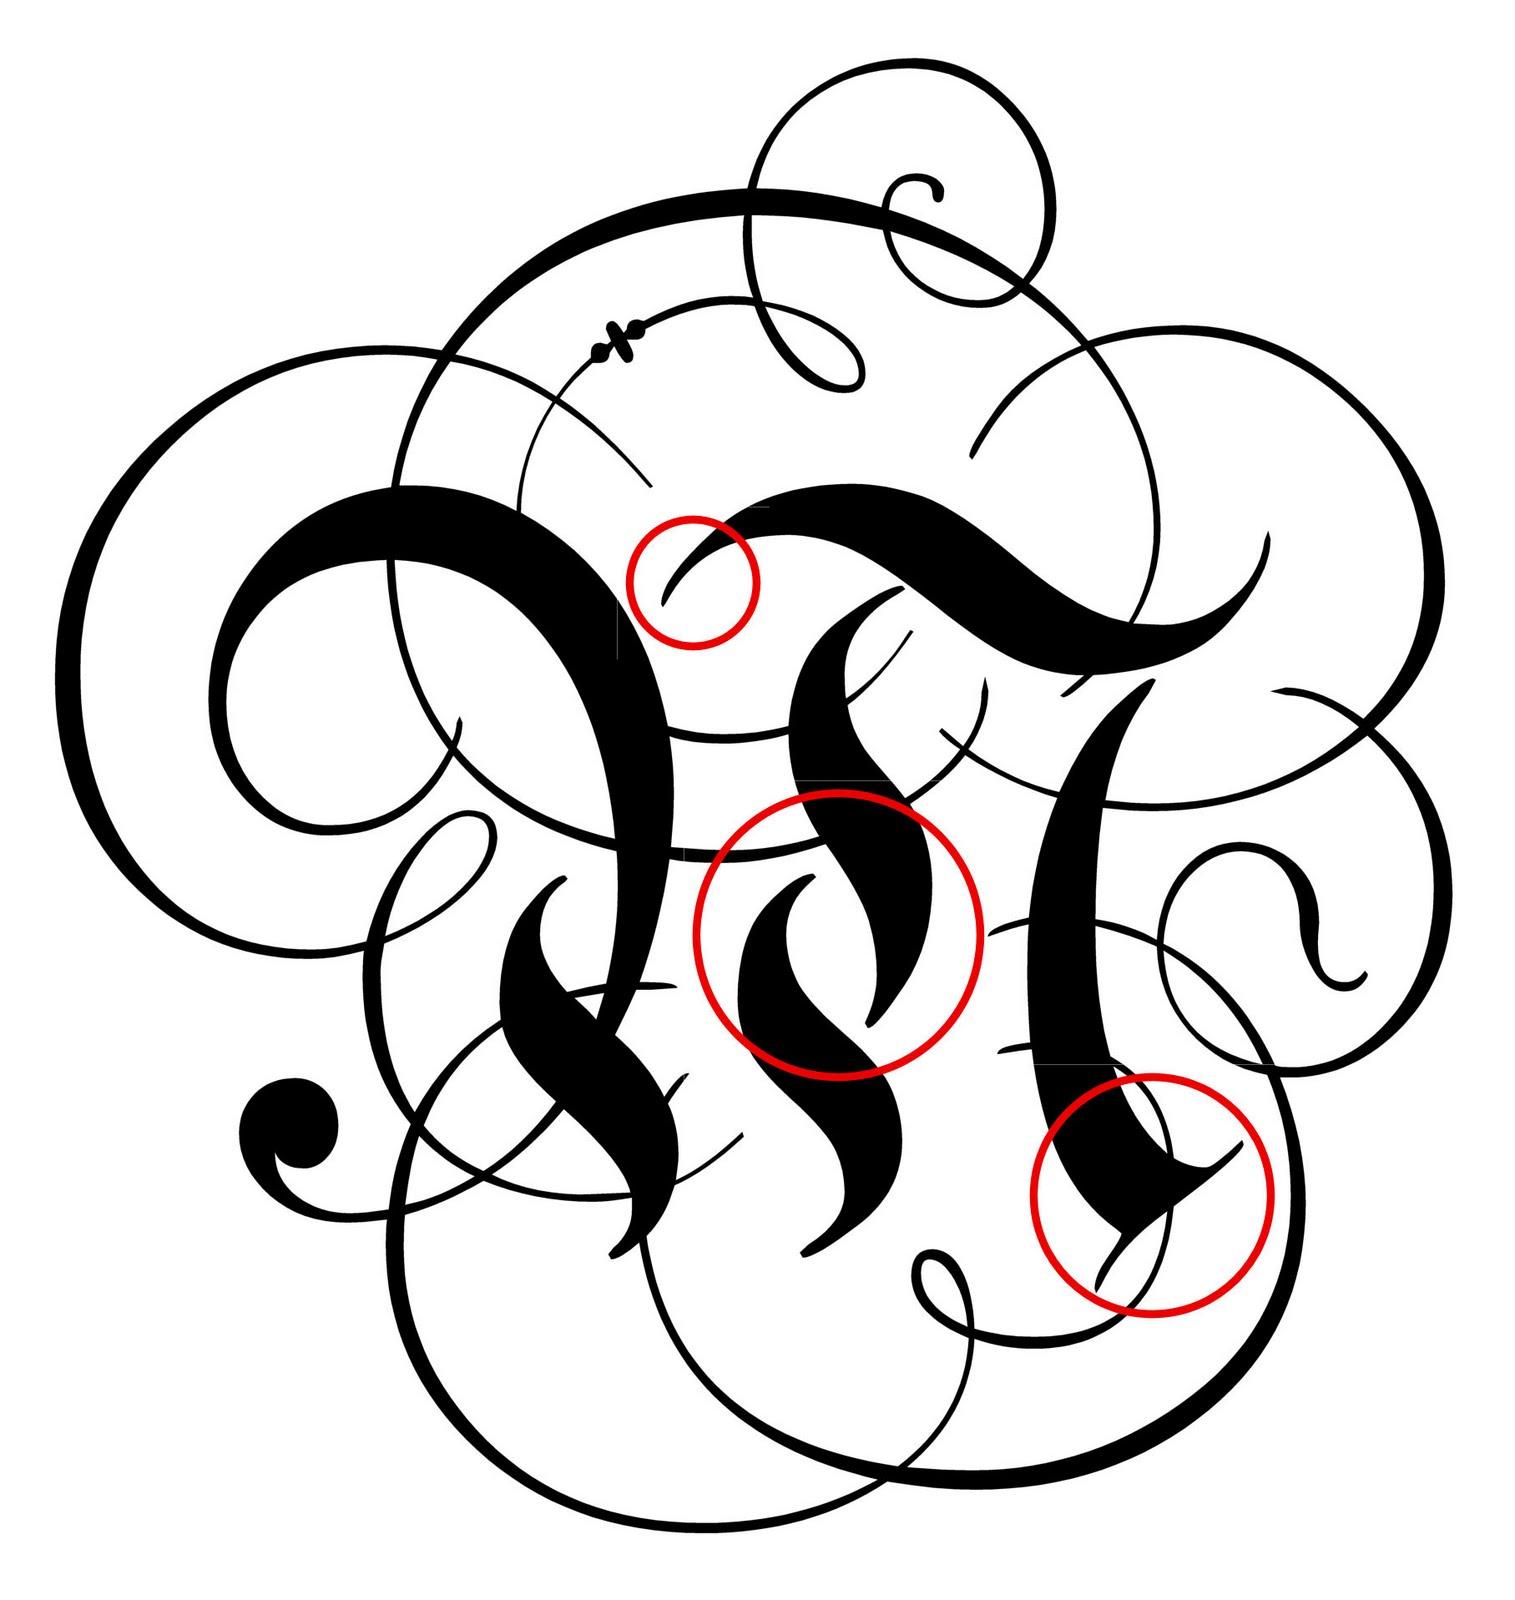 logo for logo quiz